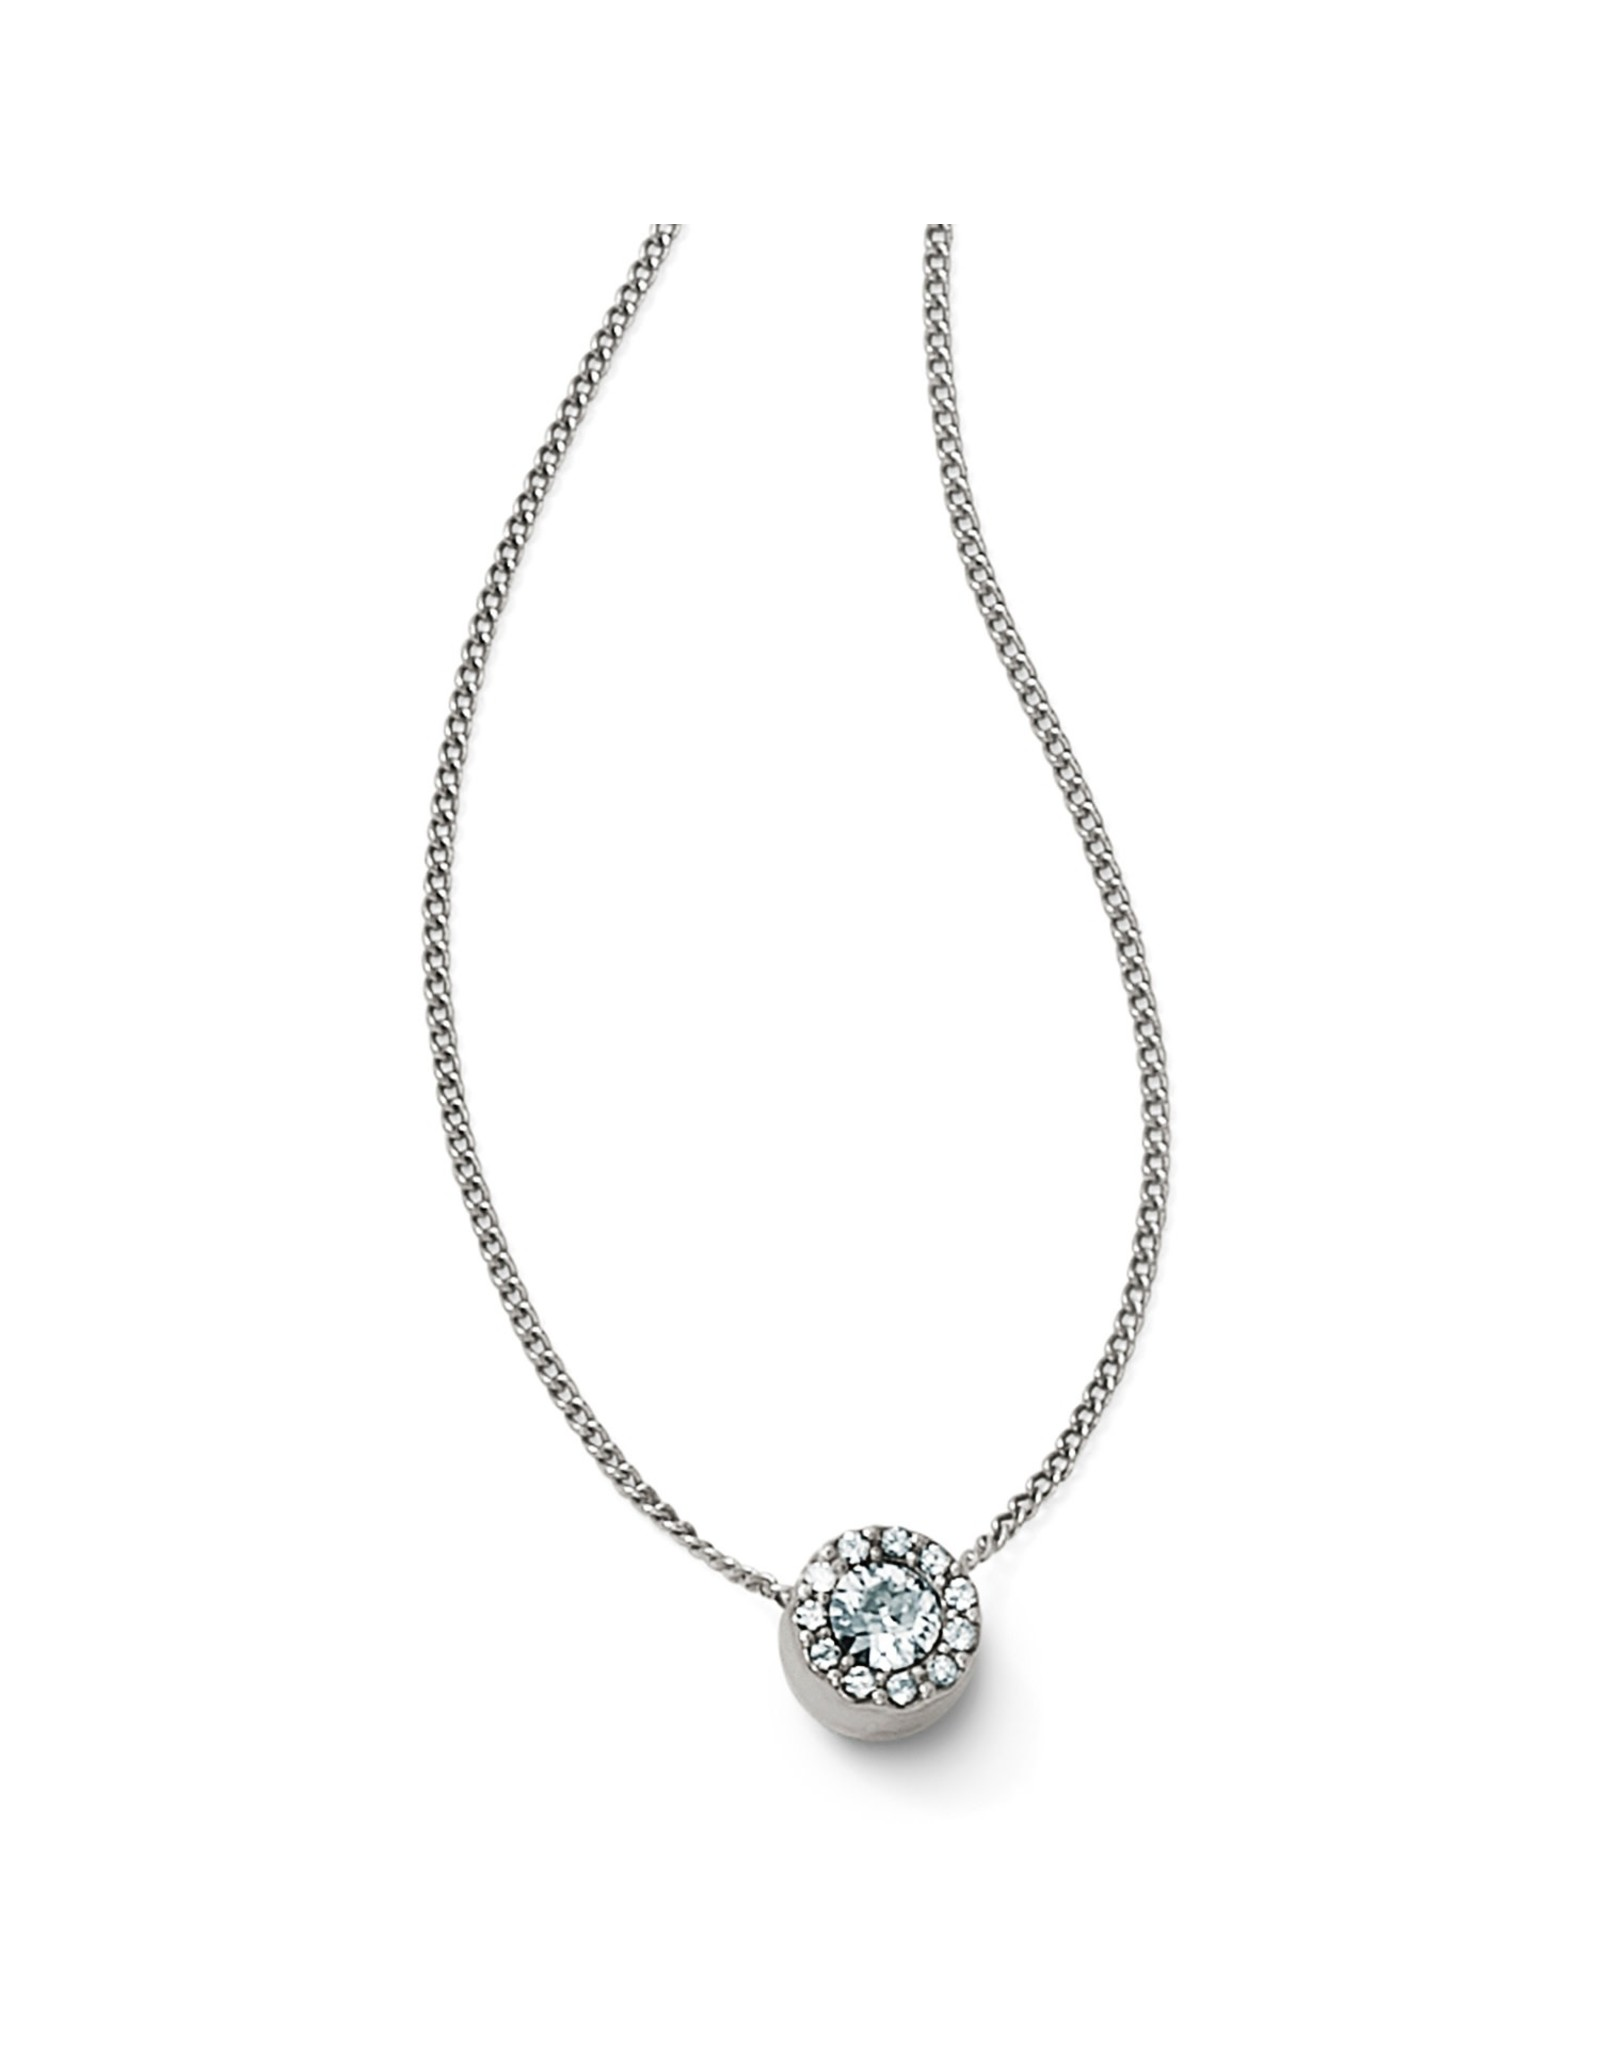 Brighton Illumina Mini Solitaire Necklace